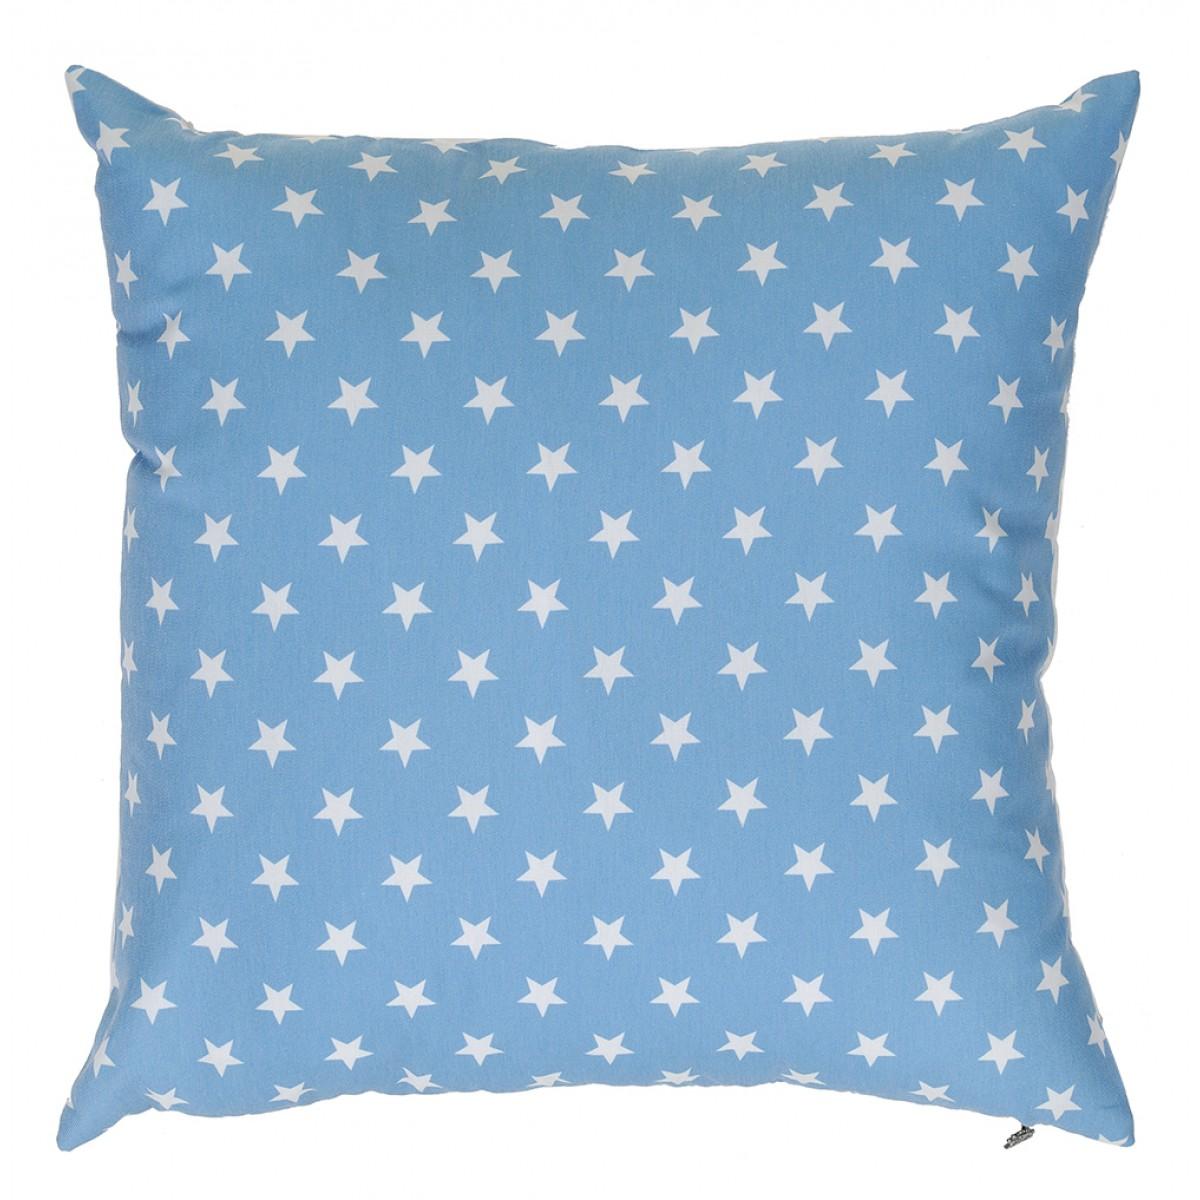 Throw Pillows With Stars : Star Throw Pillow blue throw pillows